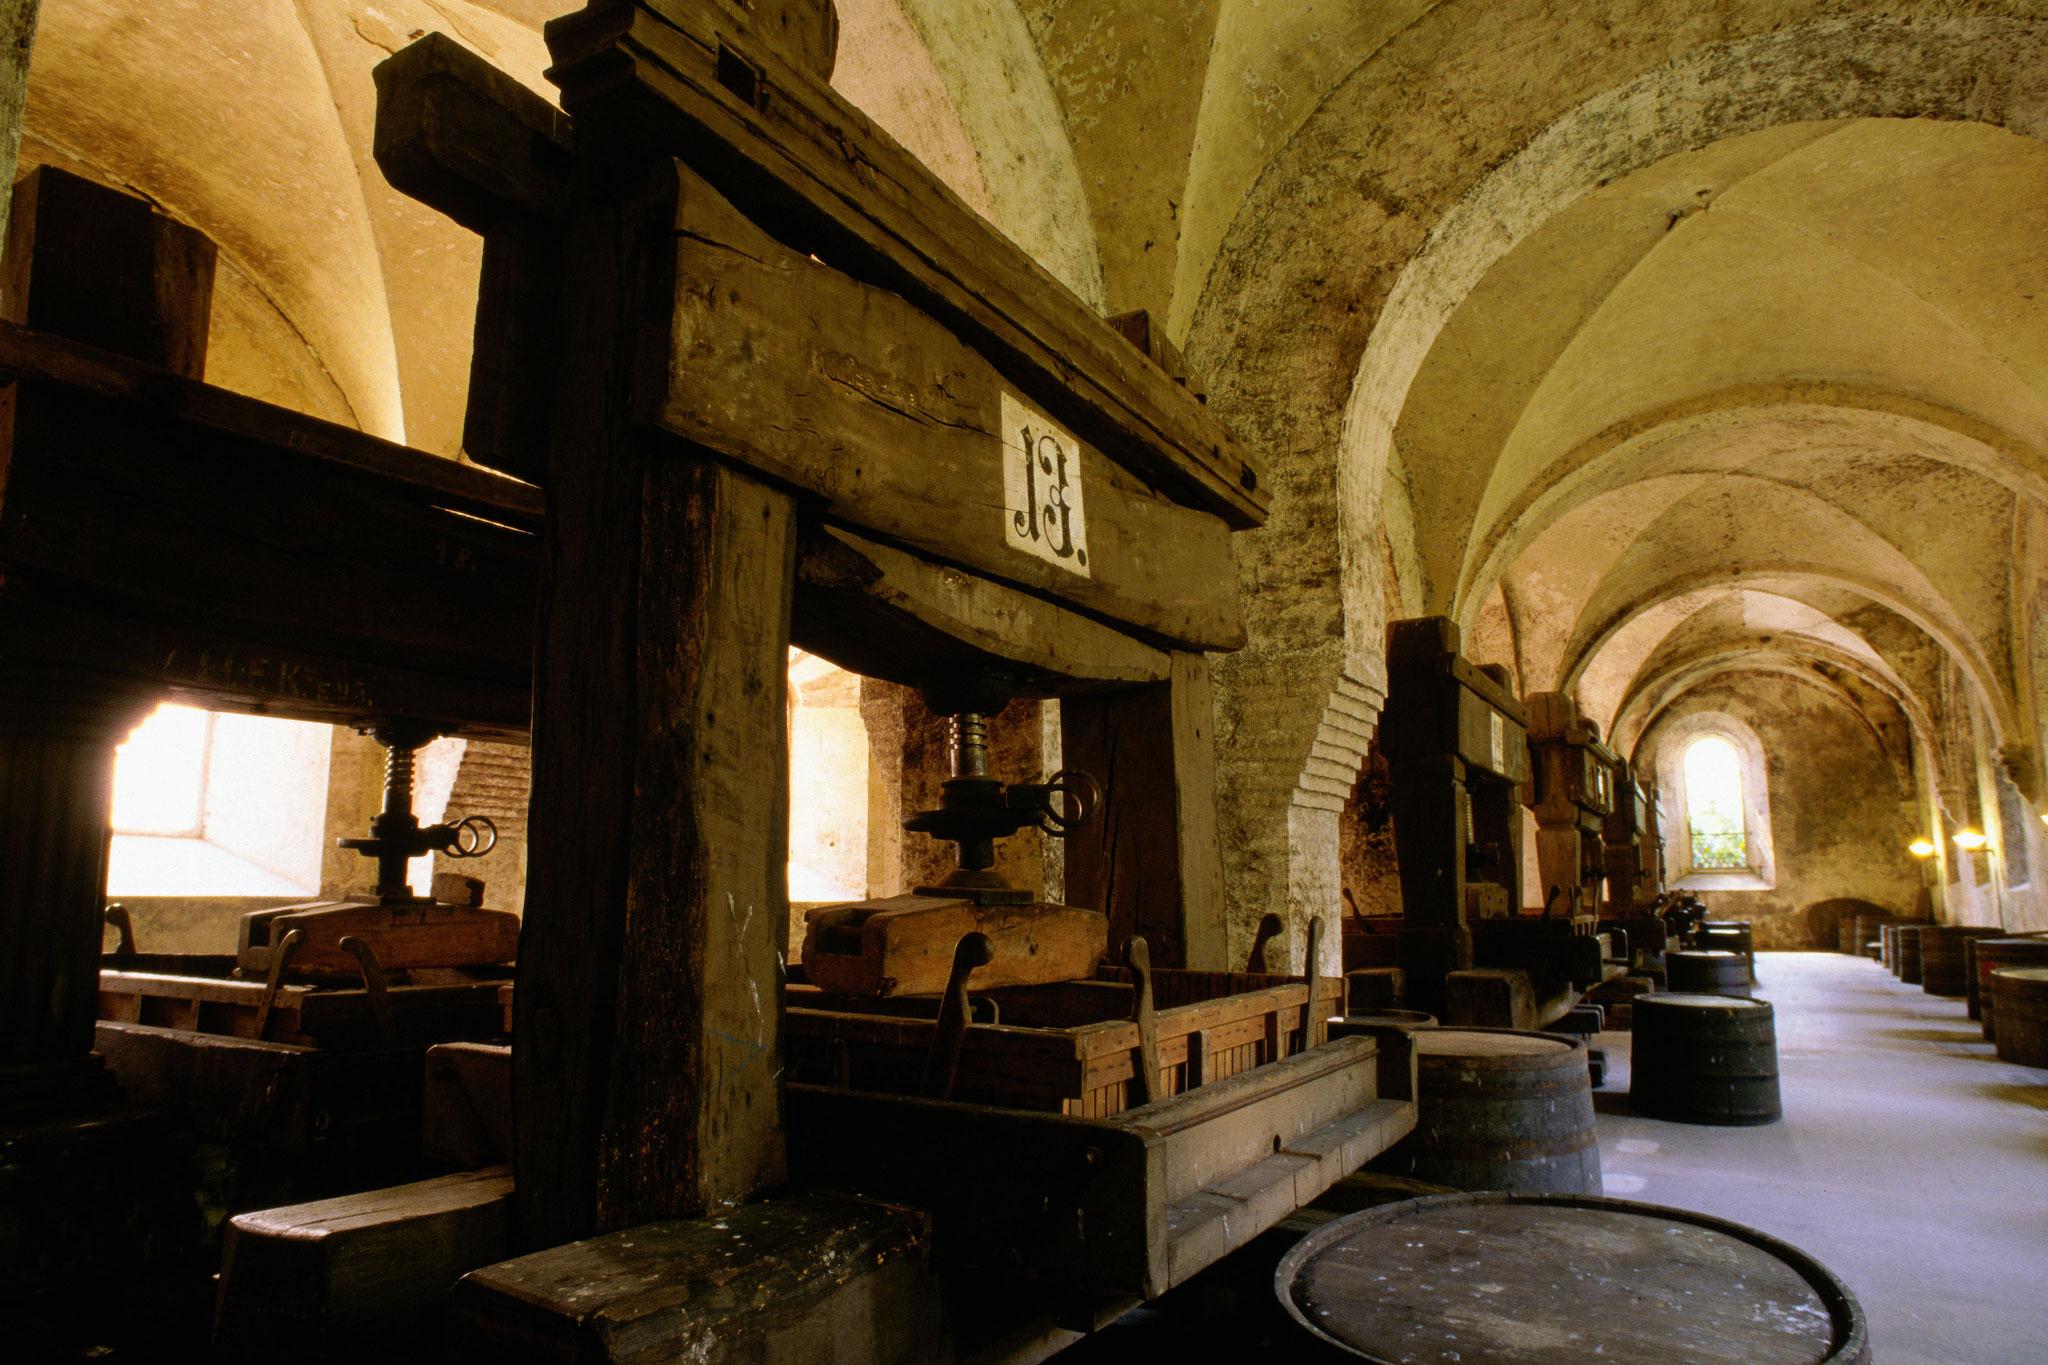 Presses at Kloster Eberbach